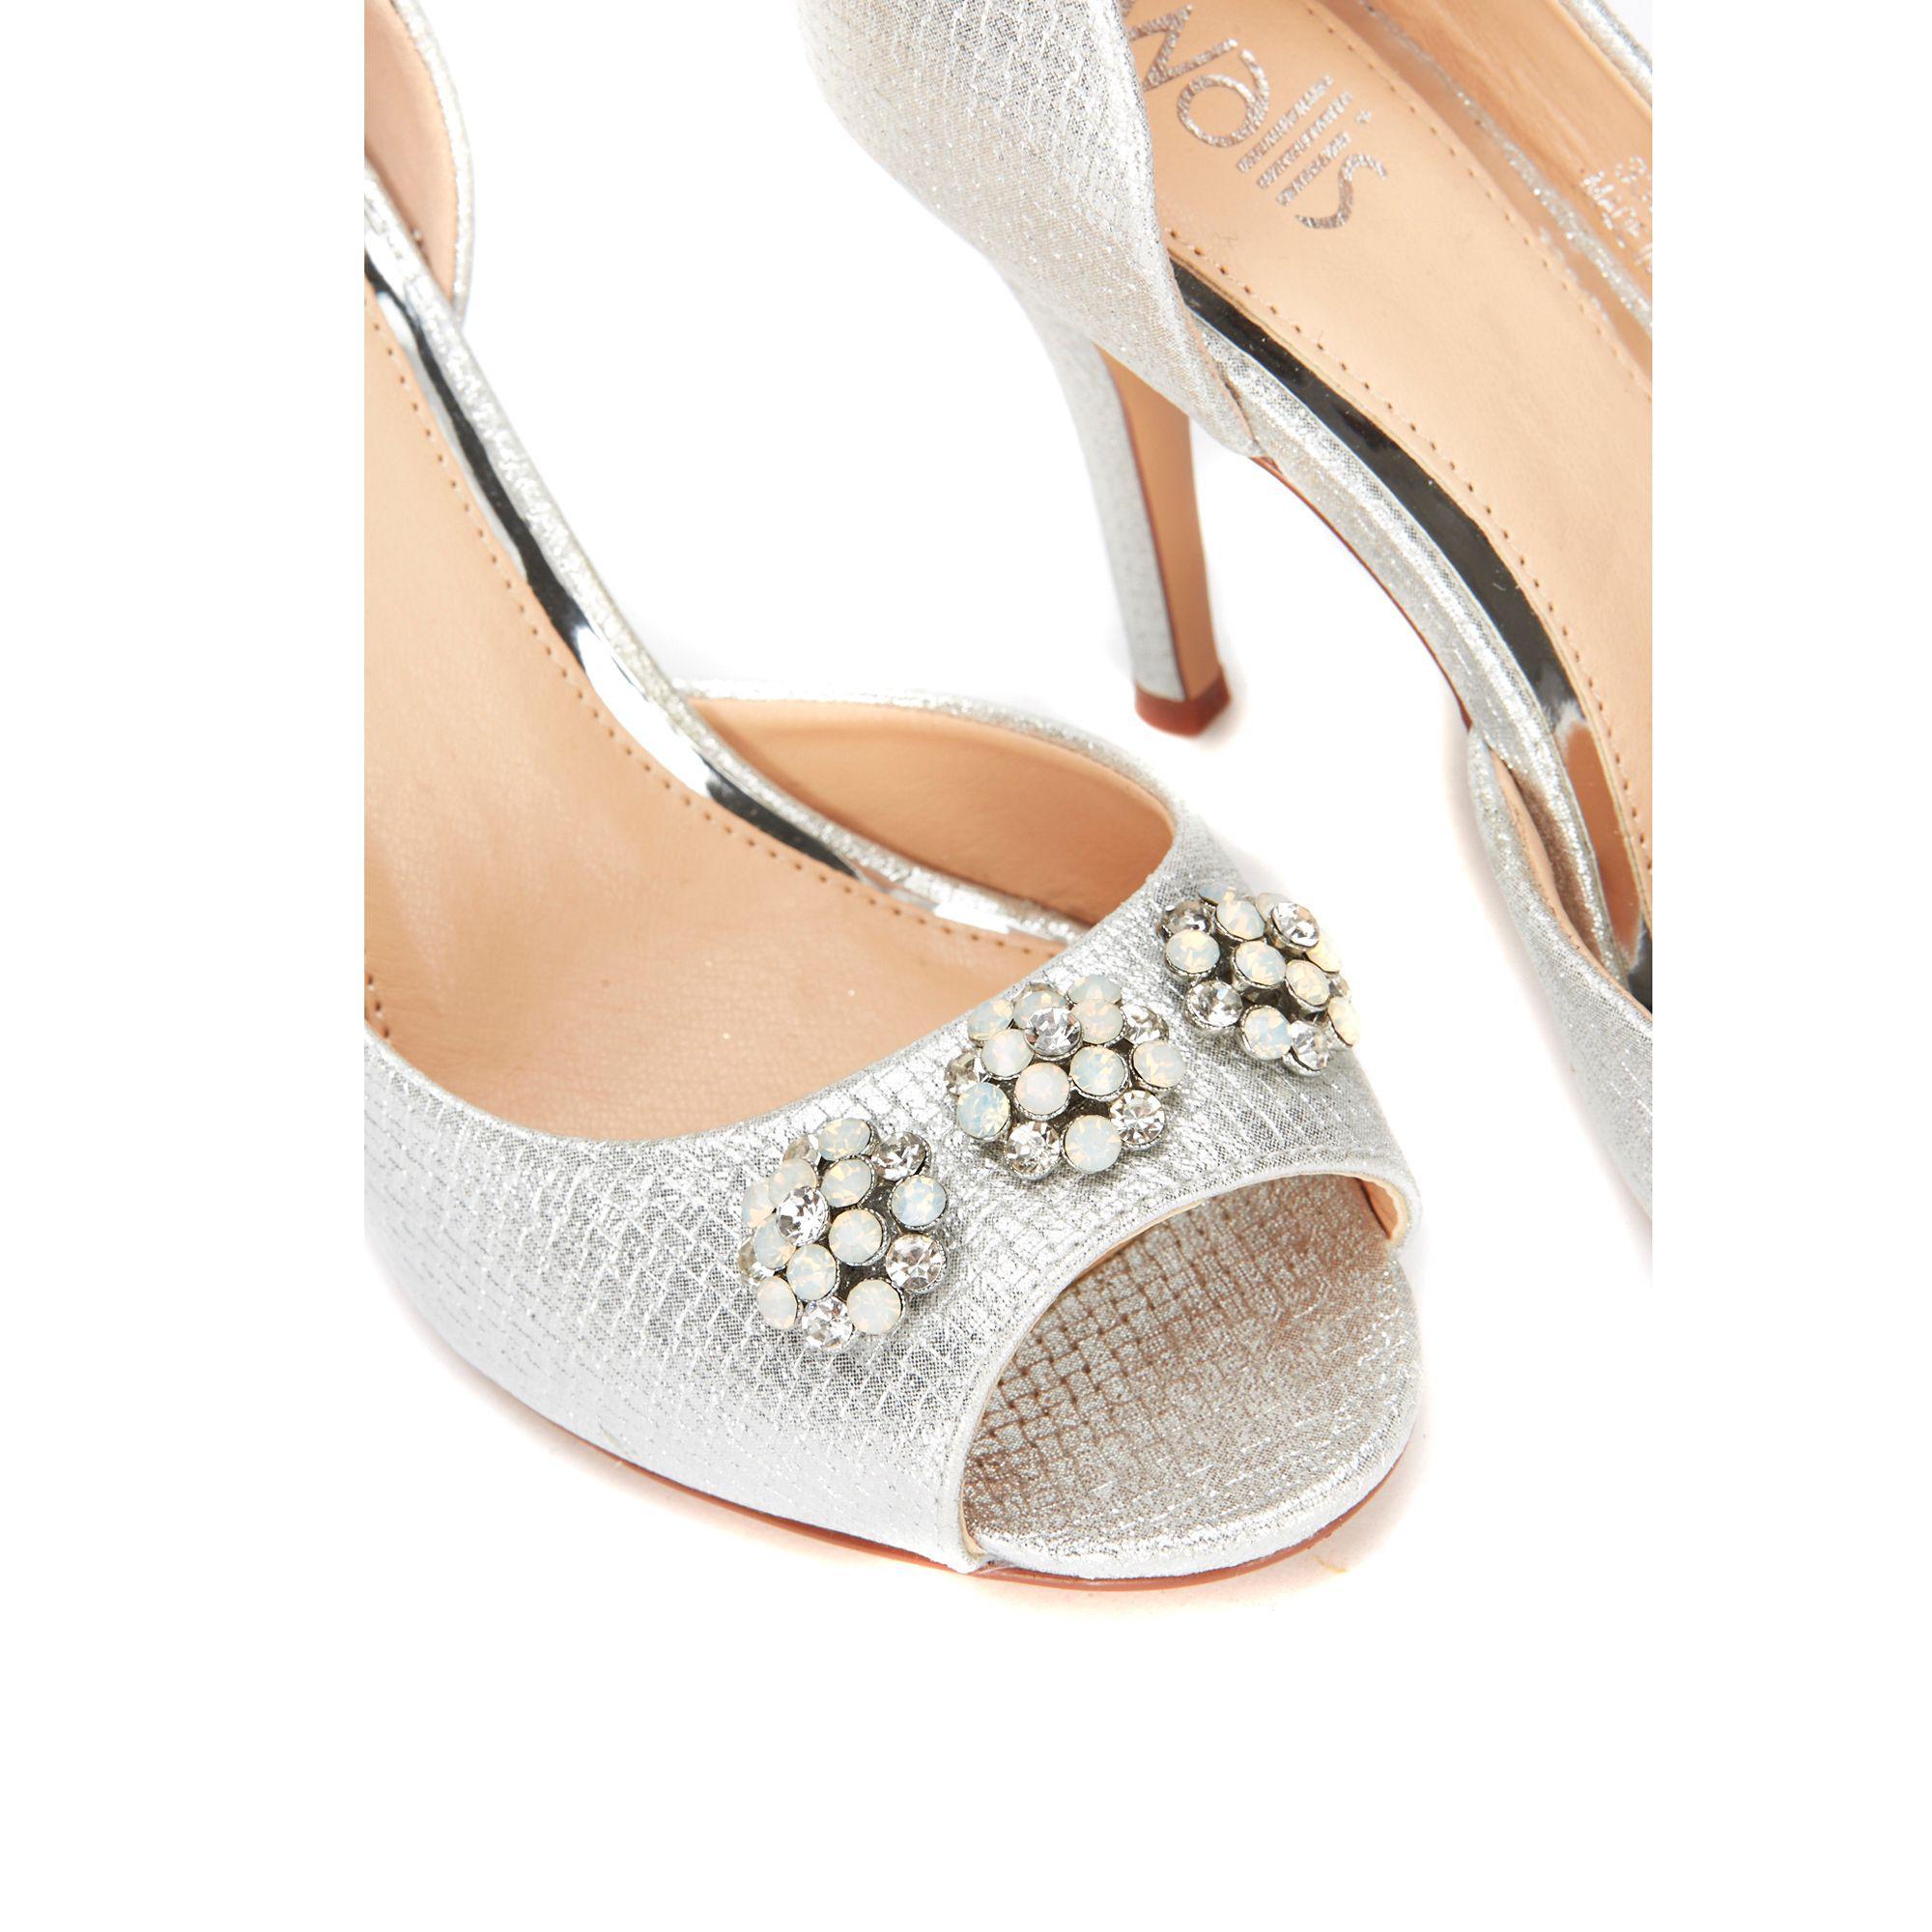 019541c77 Wallis - Metallic Silver Woven Shimmer Jewel And Pearl Peep Toe - Lyst.  View fullscreen